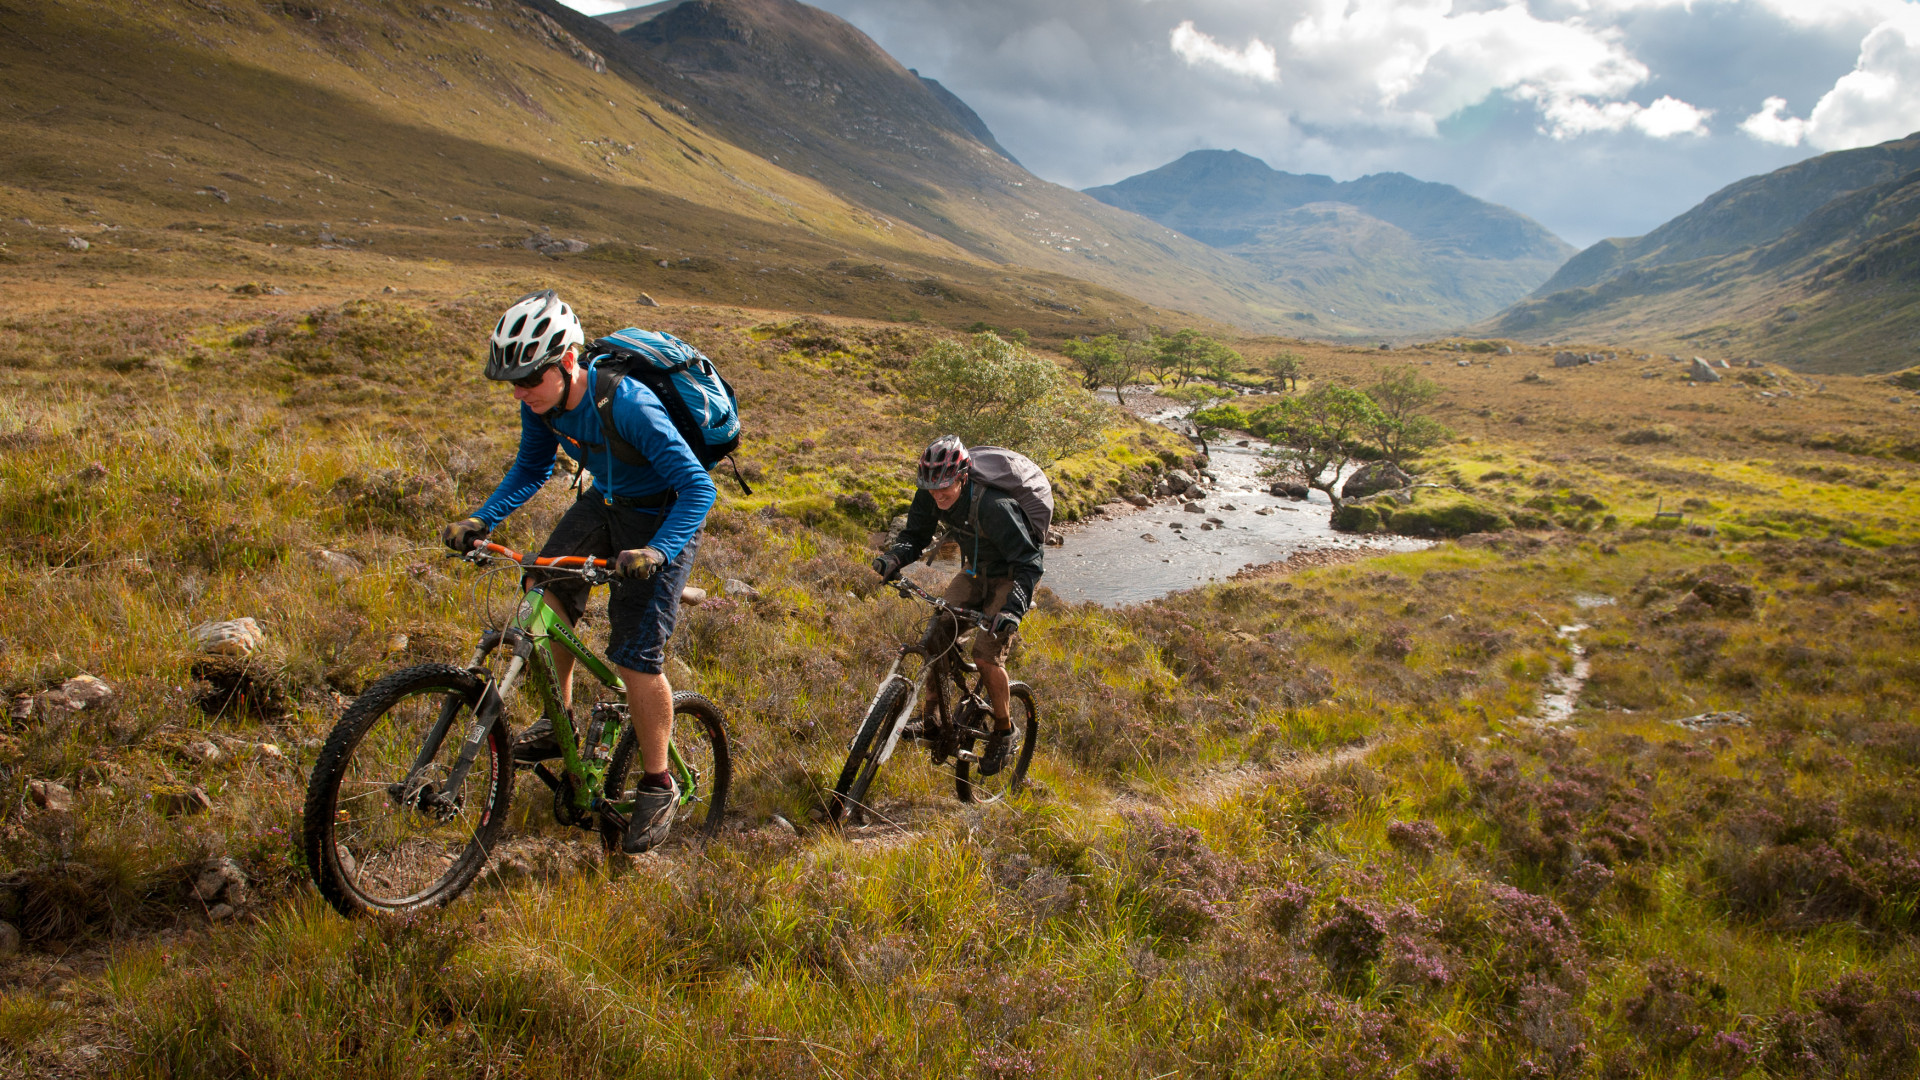 Mountain biking in the hills of Scotland